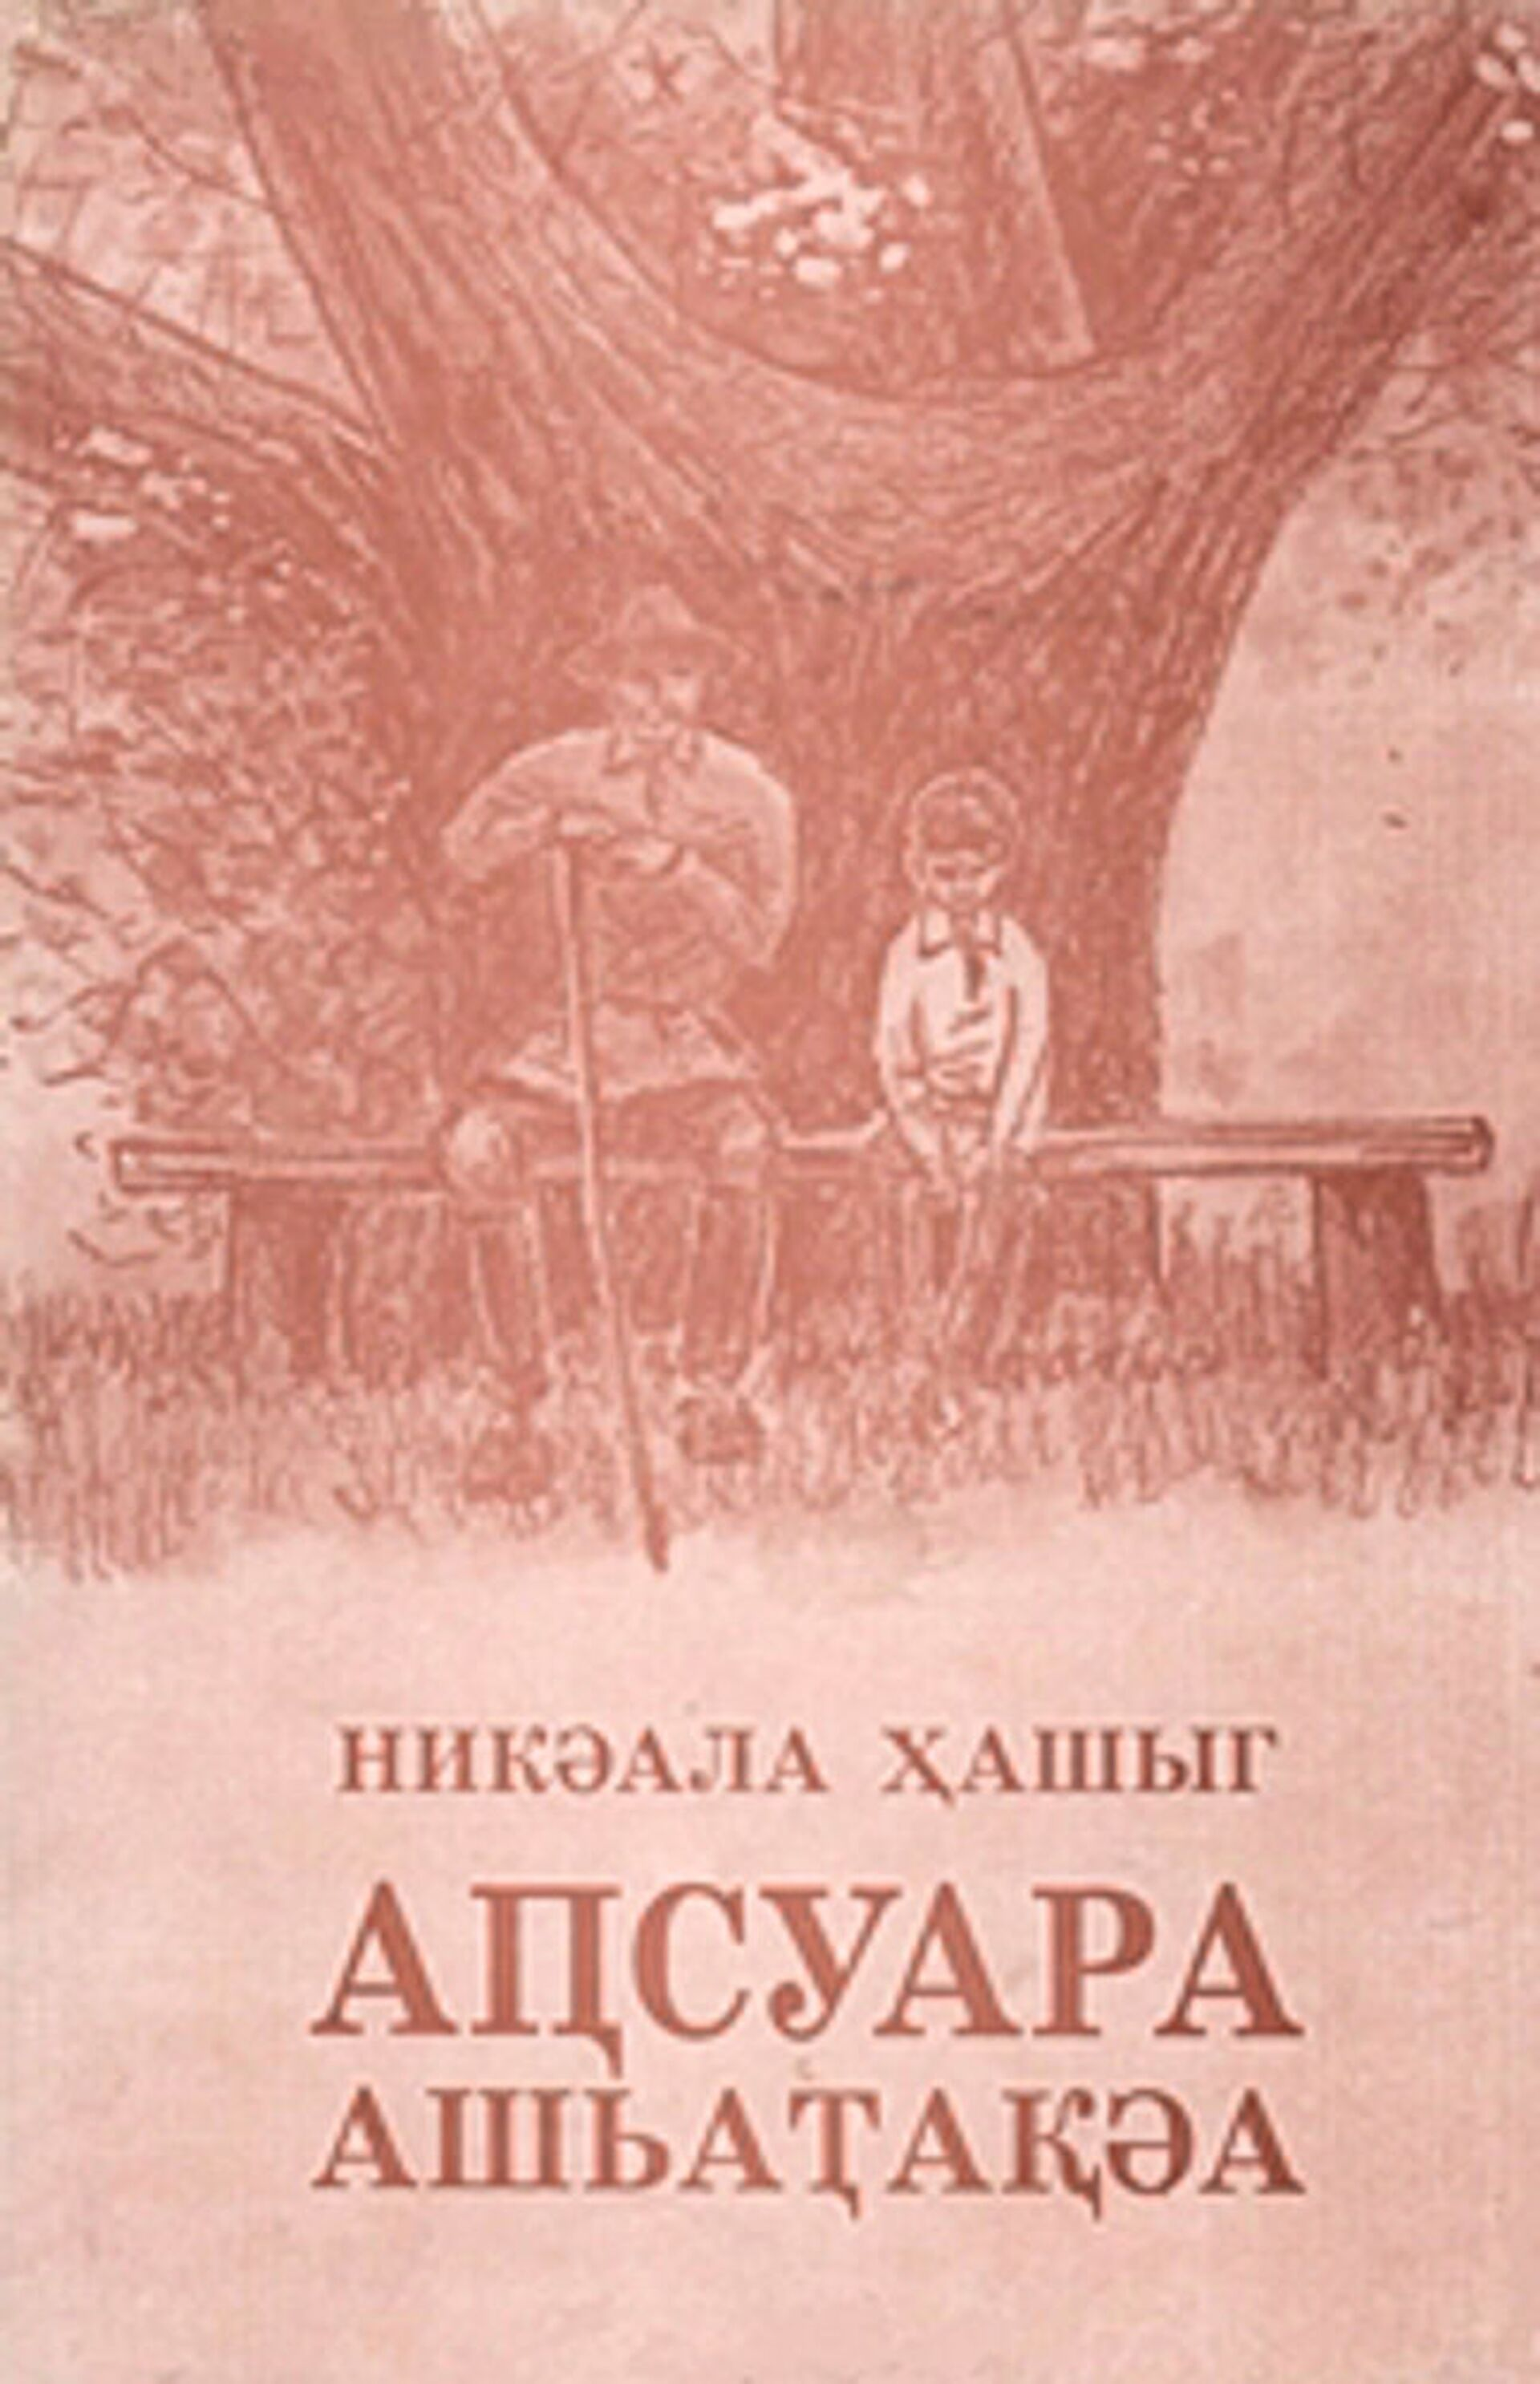 Аԥсуара ахьчара зыԥсҭазаараз: ашәҟәыҩҩы Никәала Ҳашыг диижьҭеи 89 шықәса ҵит - Sputnik Аҧсны, 1920, 13.02.2021